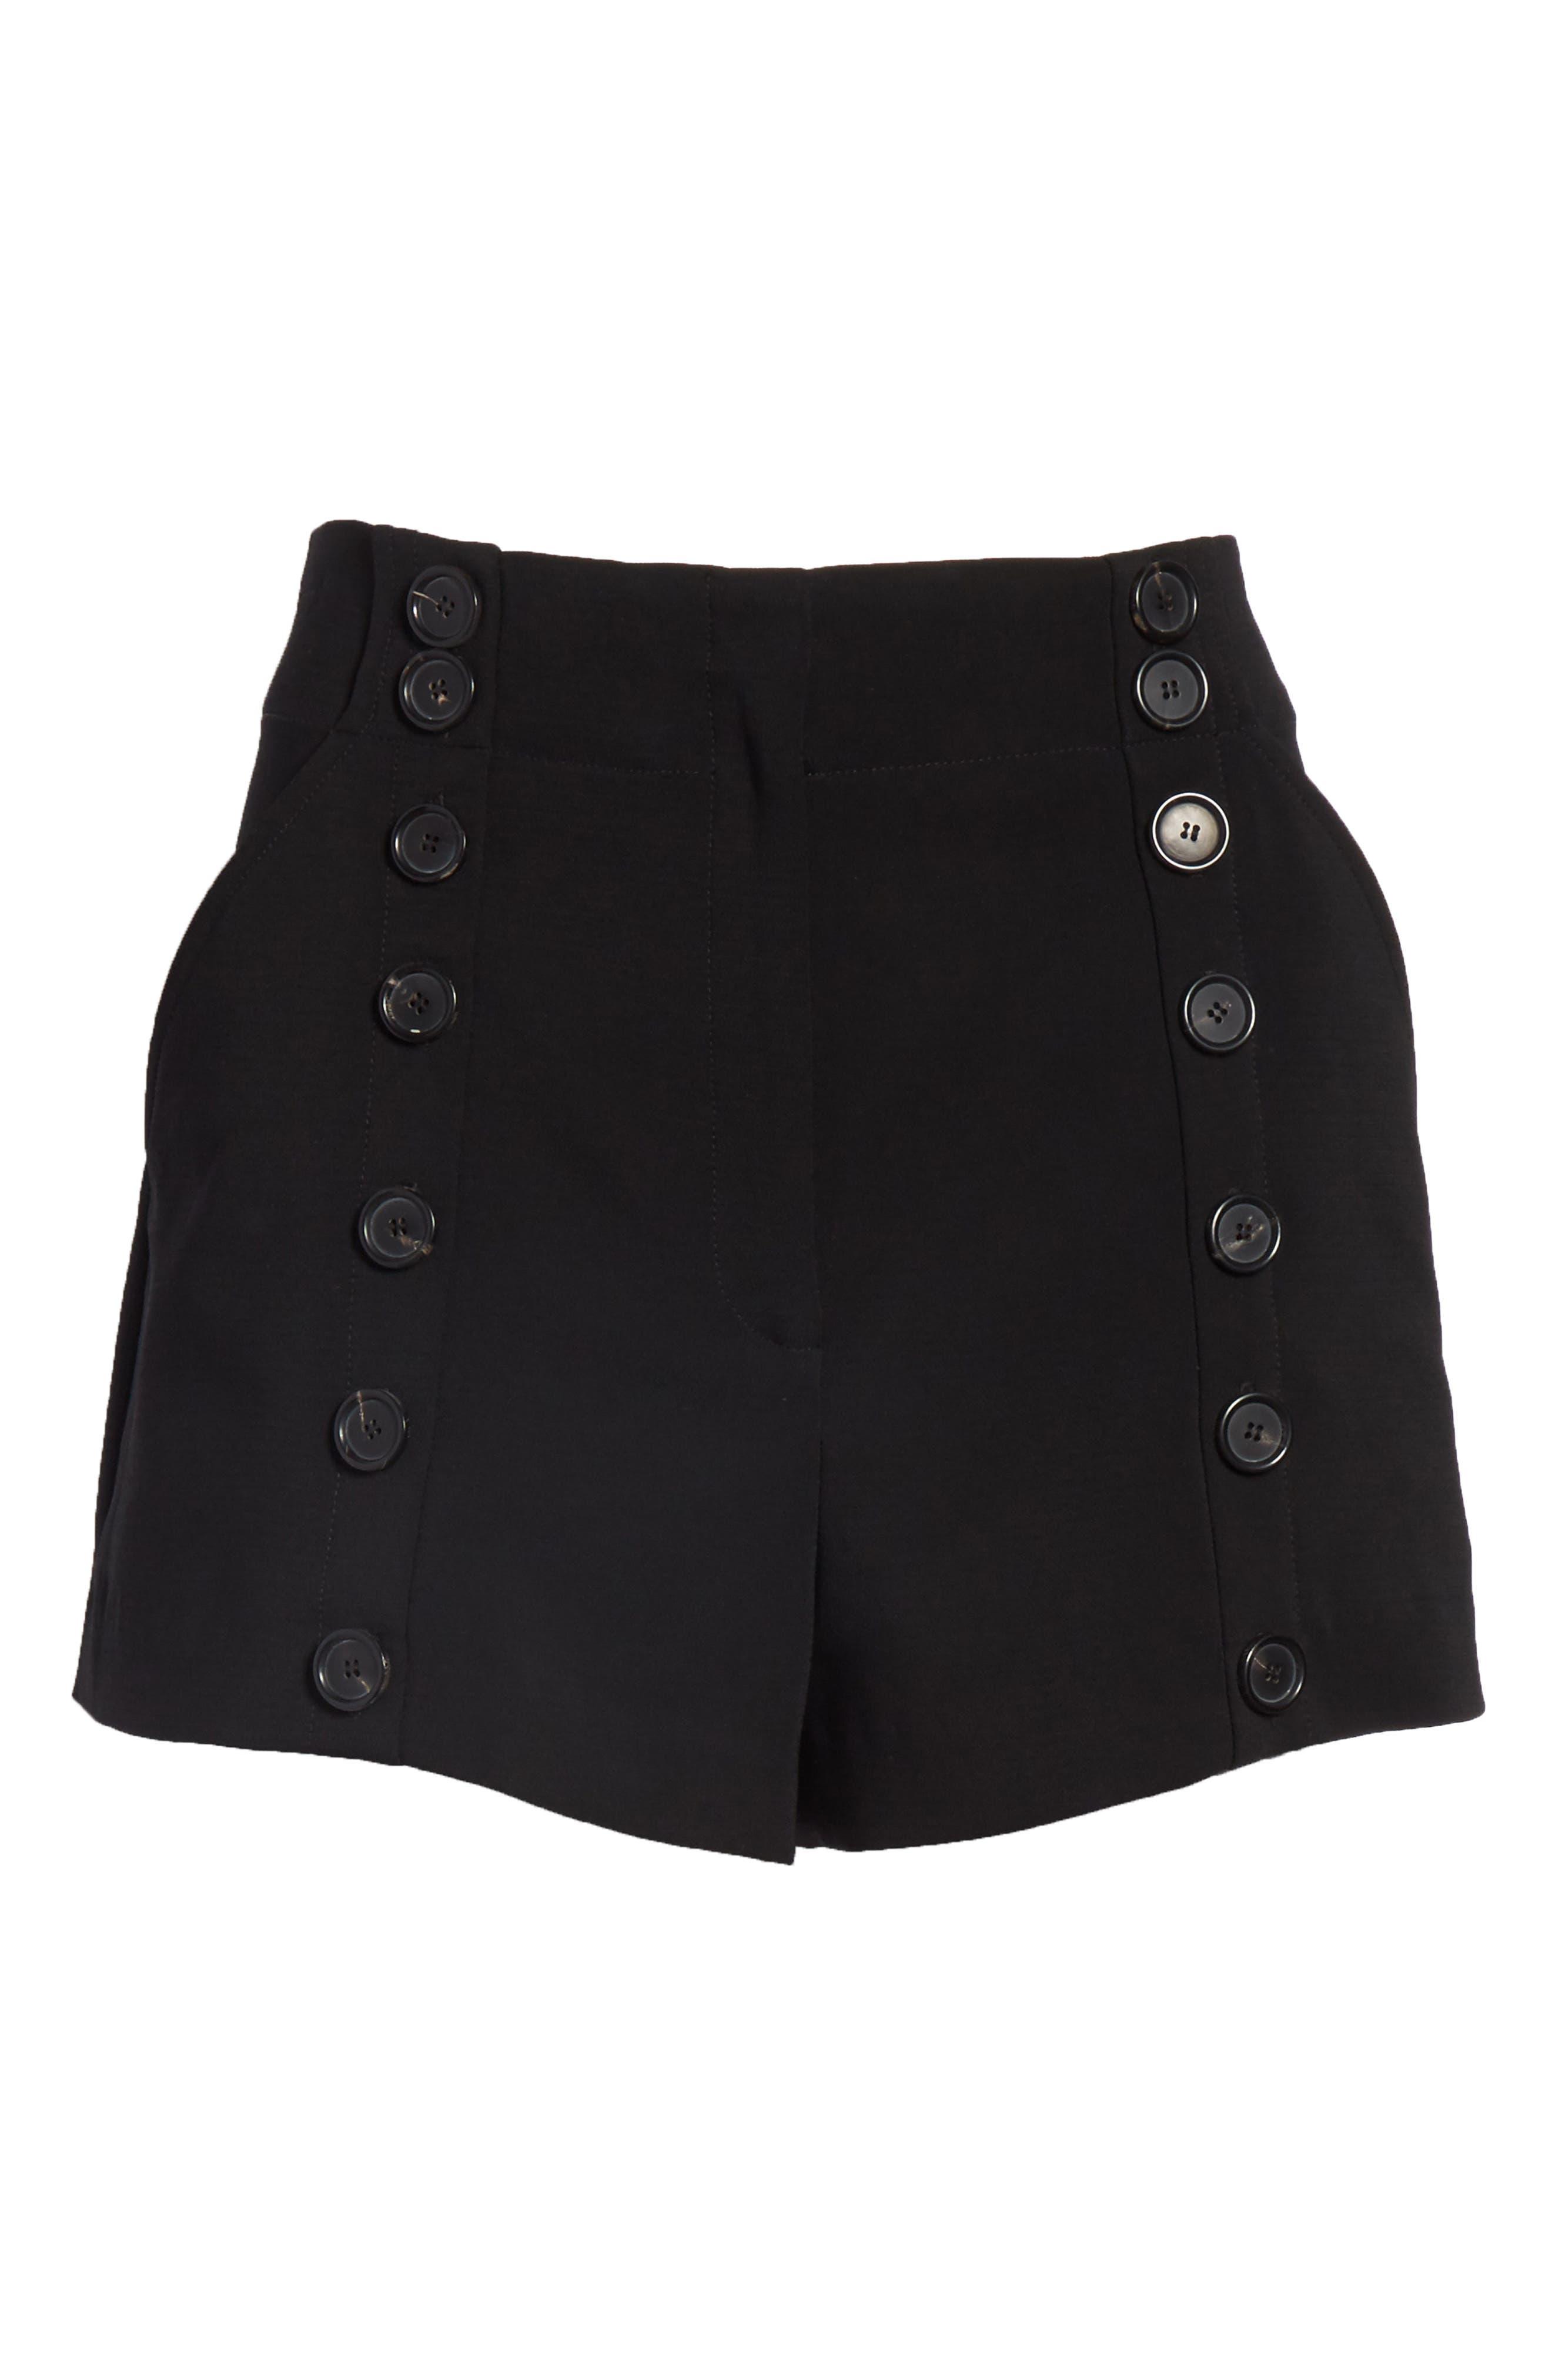 Issac Shorts,                             Alternate thumbnail 6, color,                             001